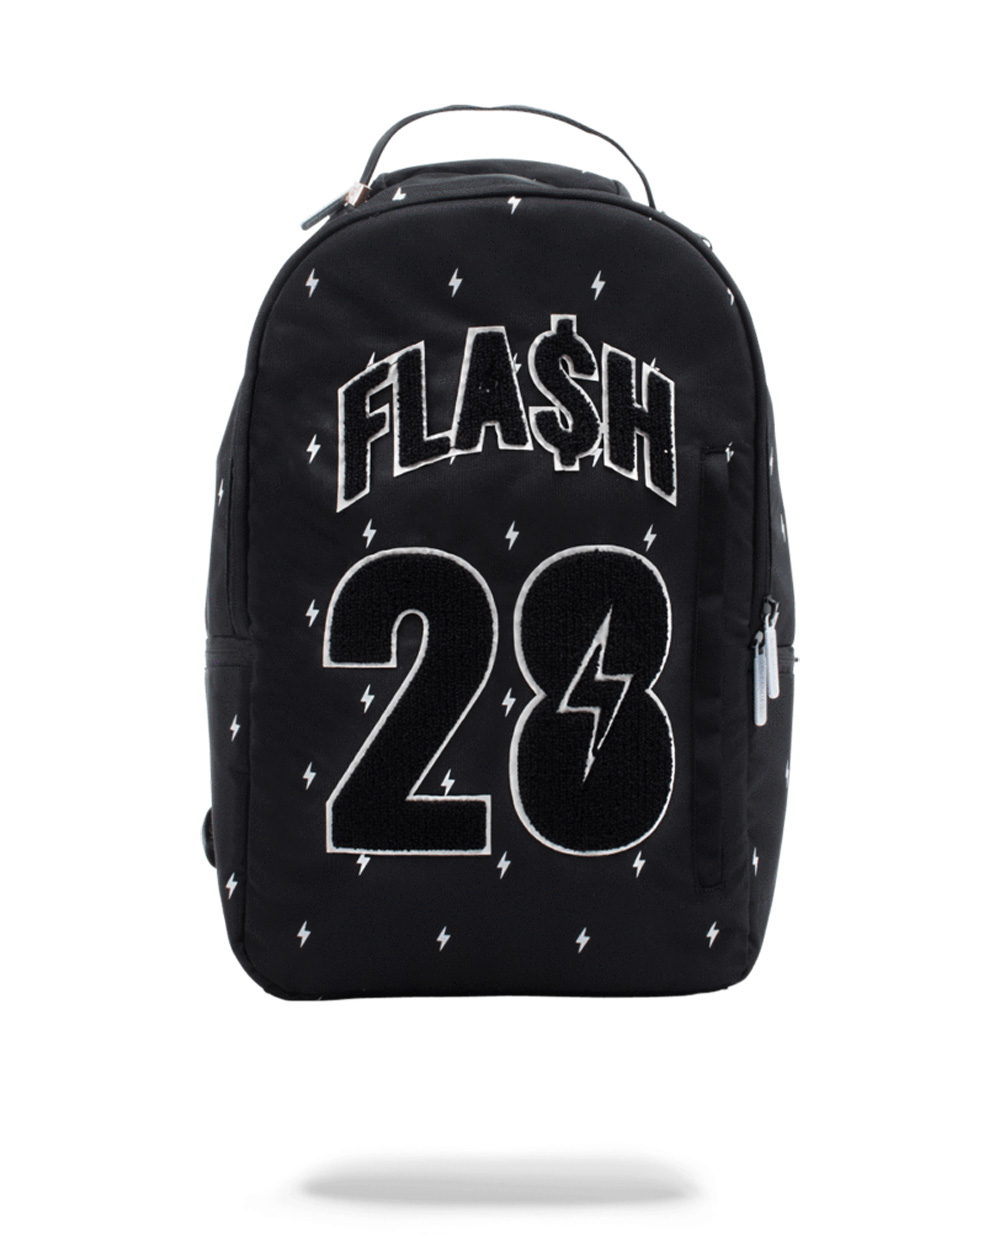 Sprayground Night Flash (Melvin Gordon Collaboration) Backpack